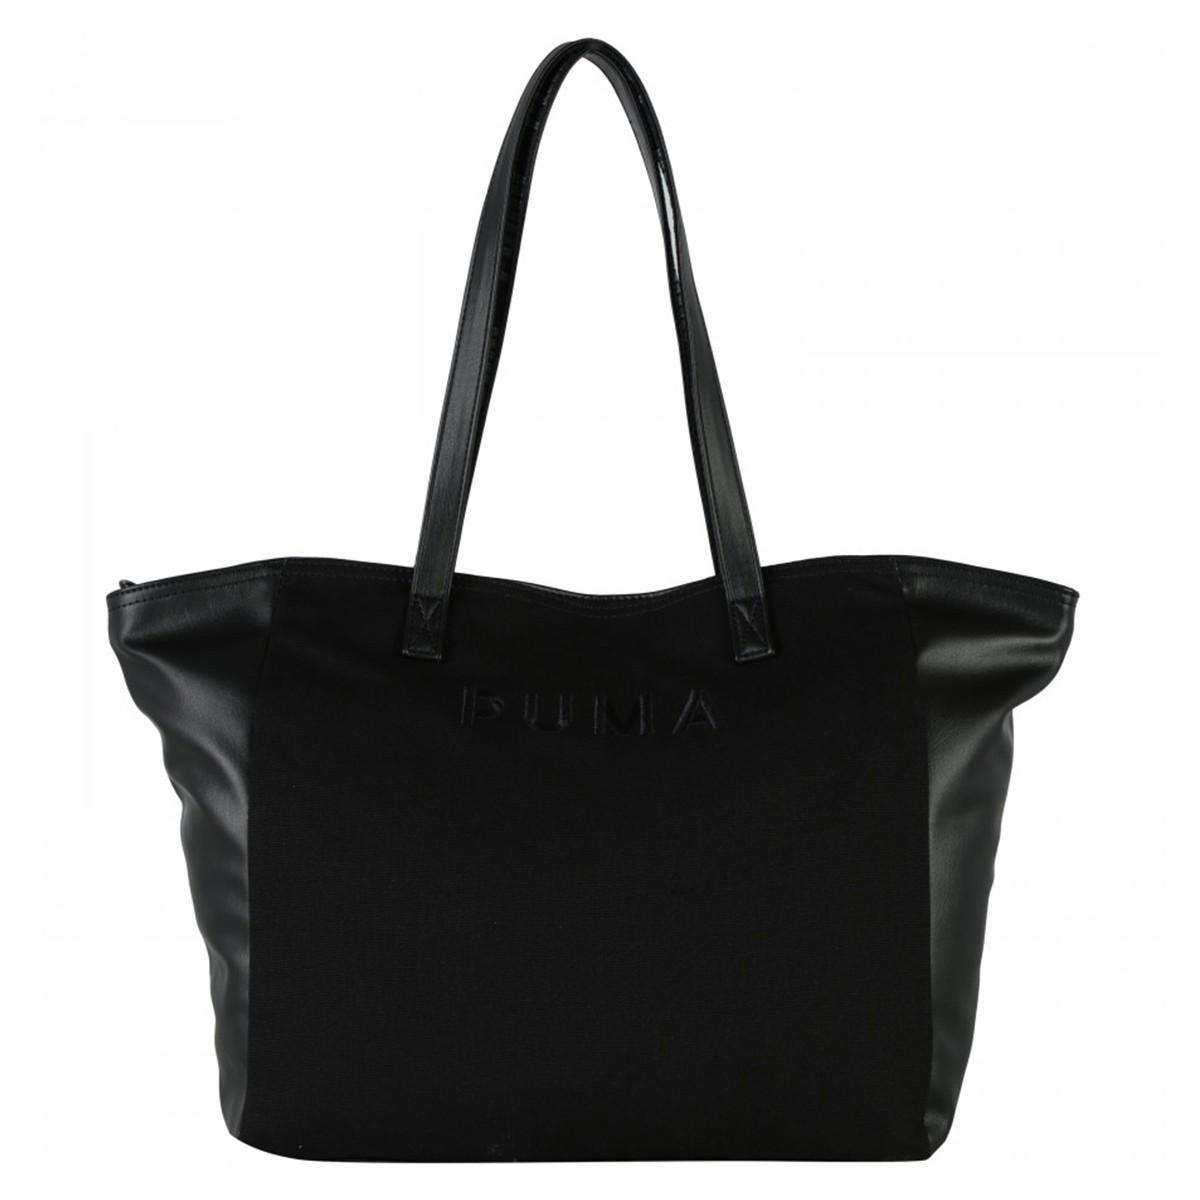 Bolsa Puma Classic Large Shopper - Preta - Feminina